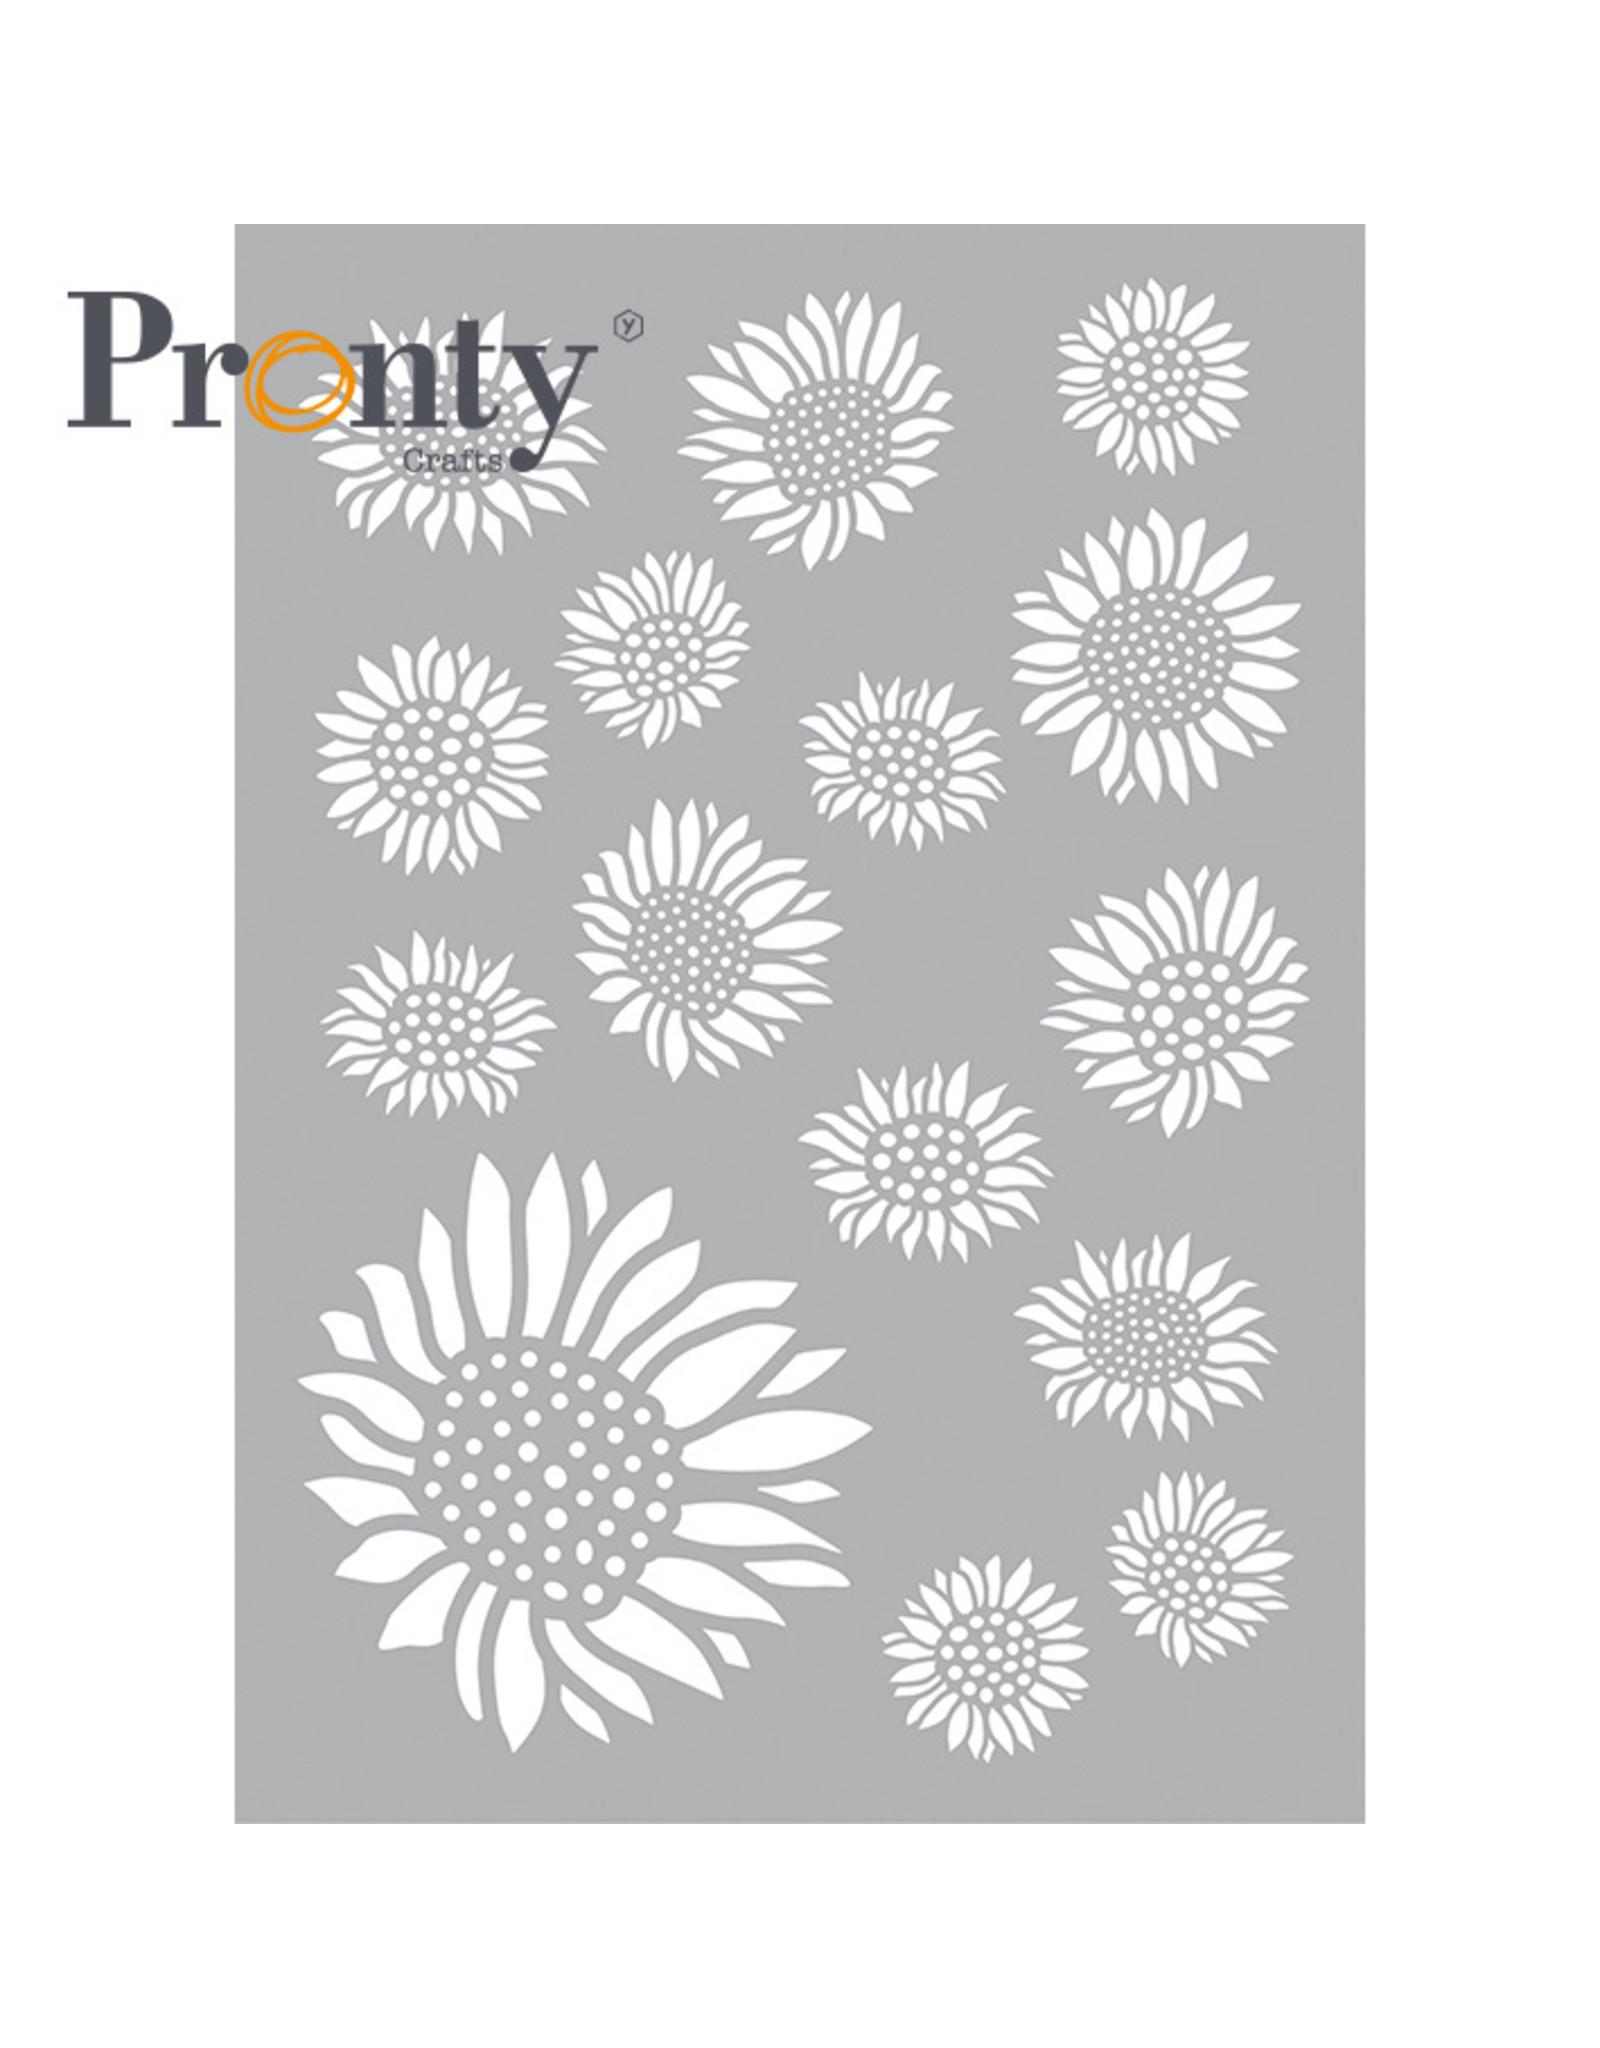 Pronty Crafts Stencil Sunflowers A5